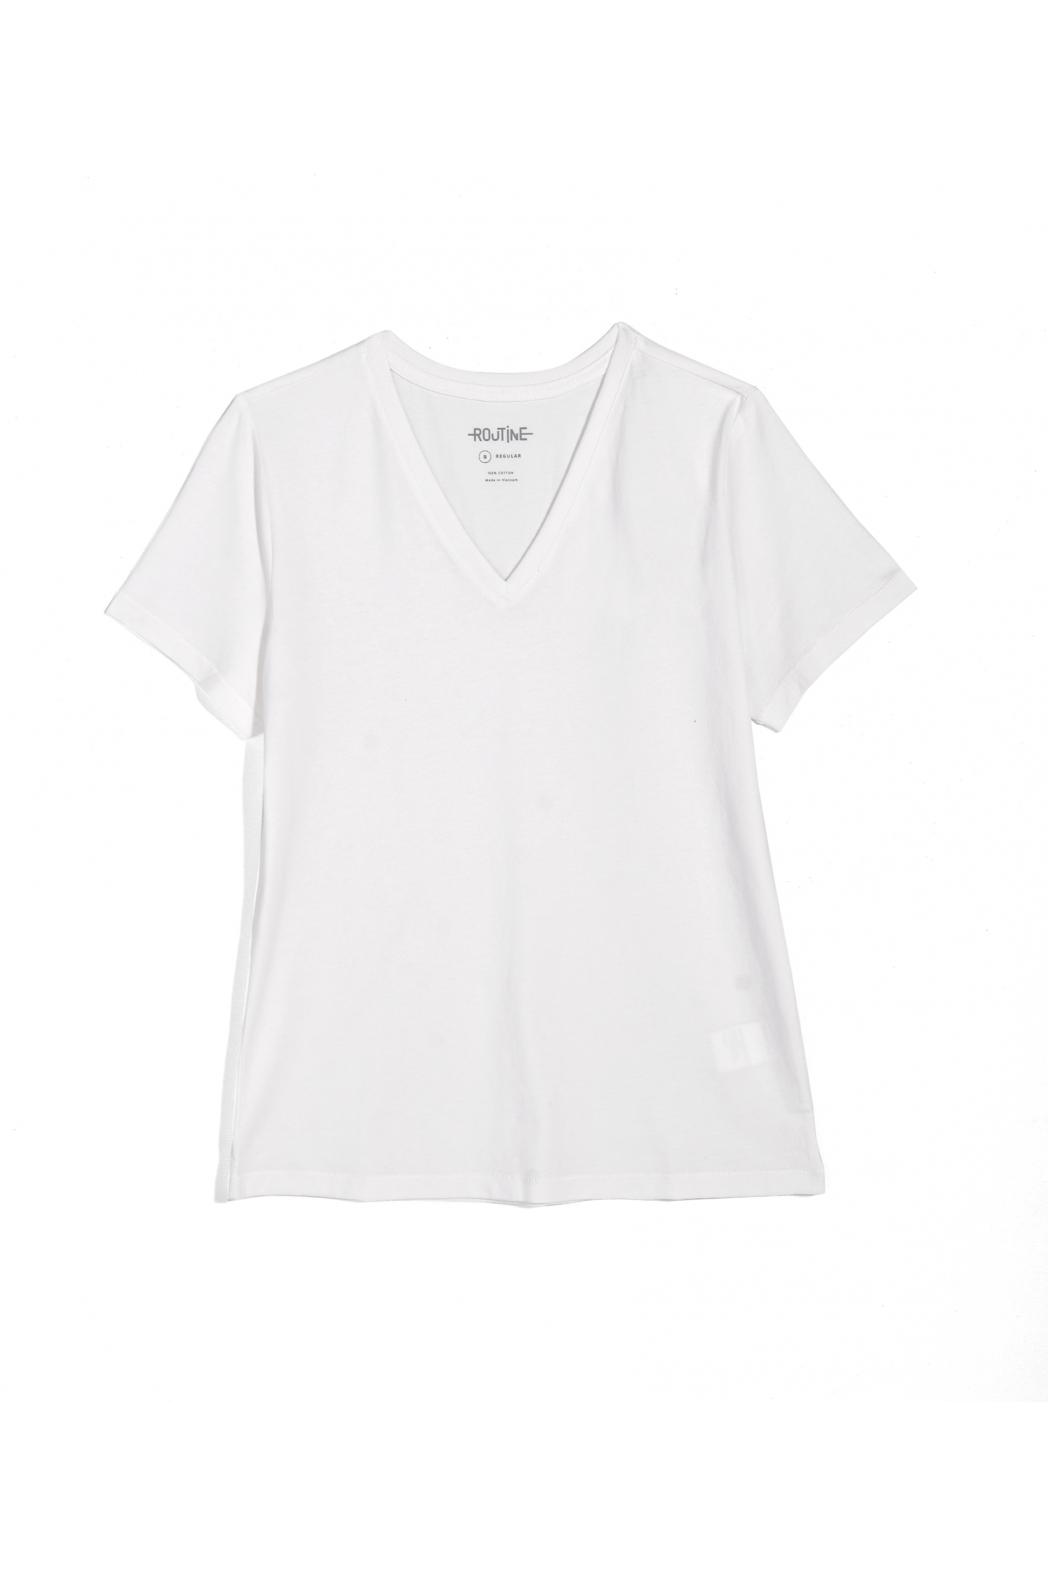 Áo thun tay ngắn, cổ V. Cotton - 10F20TSHW001